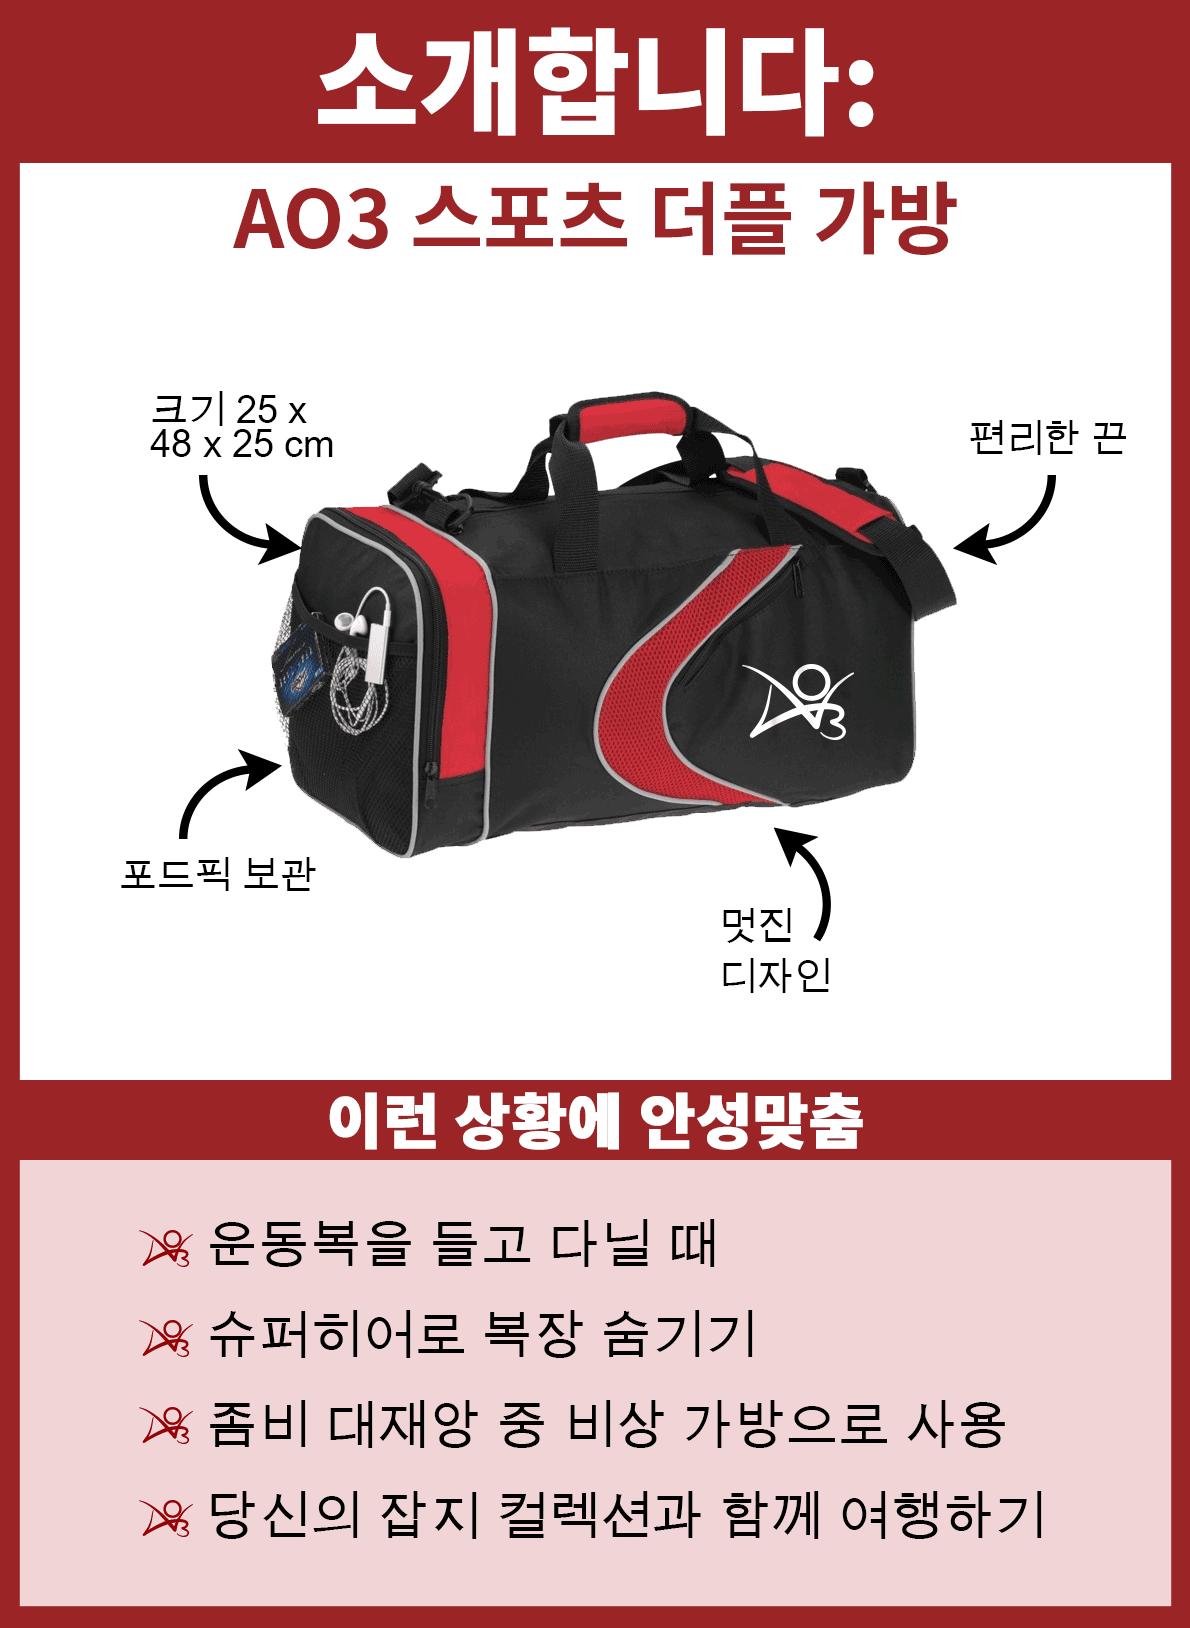 AO3 스포츠 더플 가방을 소개합니다. 검은색과 붉은색으로 포인트를 준 가방에는 세련된 붉은 디자인과 하얀색 AO3로고가 측면에 자리하고 있습니다. 크기는 25 x 48 x 25 cm입니다. 편리한 어깨끈과 포드픽을 넣기에 안성맞춤인 그물망도 포함됩니다. 운동복을 넣어 다니고 여러분의 슈퍼히어로 복장을 보관하거나 좀비 대재앙을 대비한 비상 가방으로, 또 잡지 컬렉션을 들고 여행을 하고 싶을 때 안성맞춤입니다.